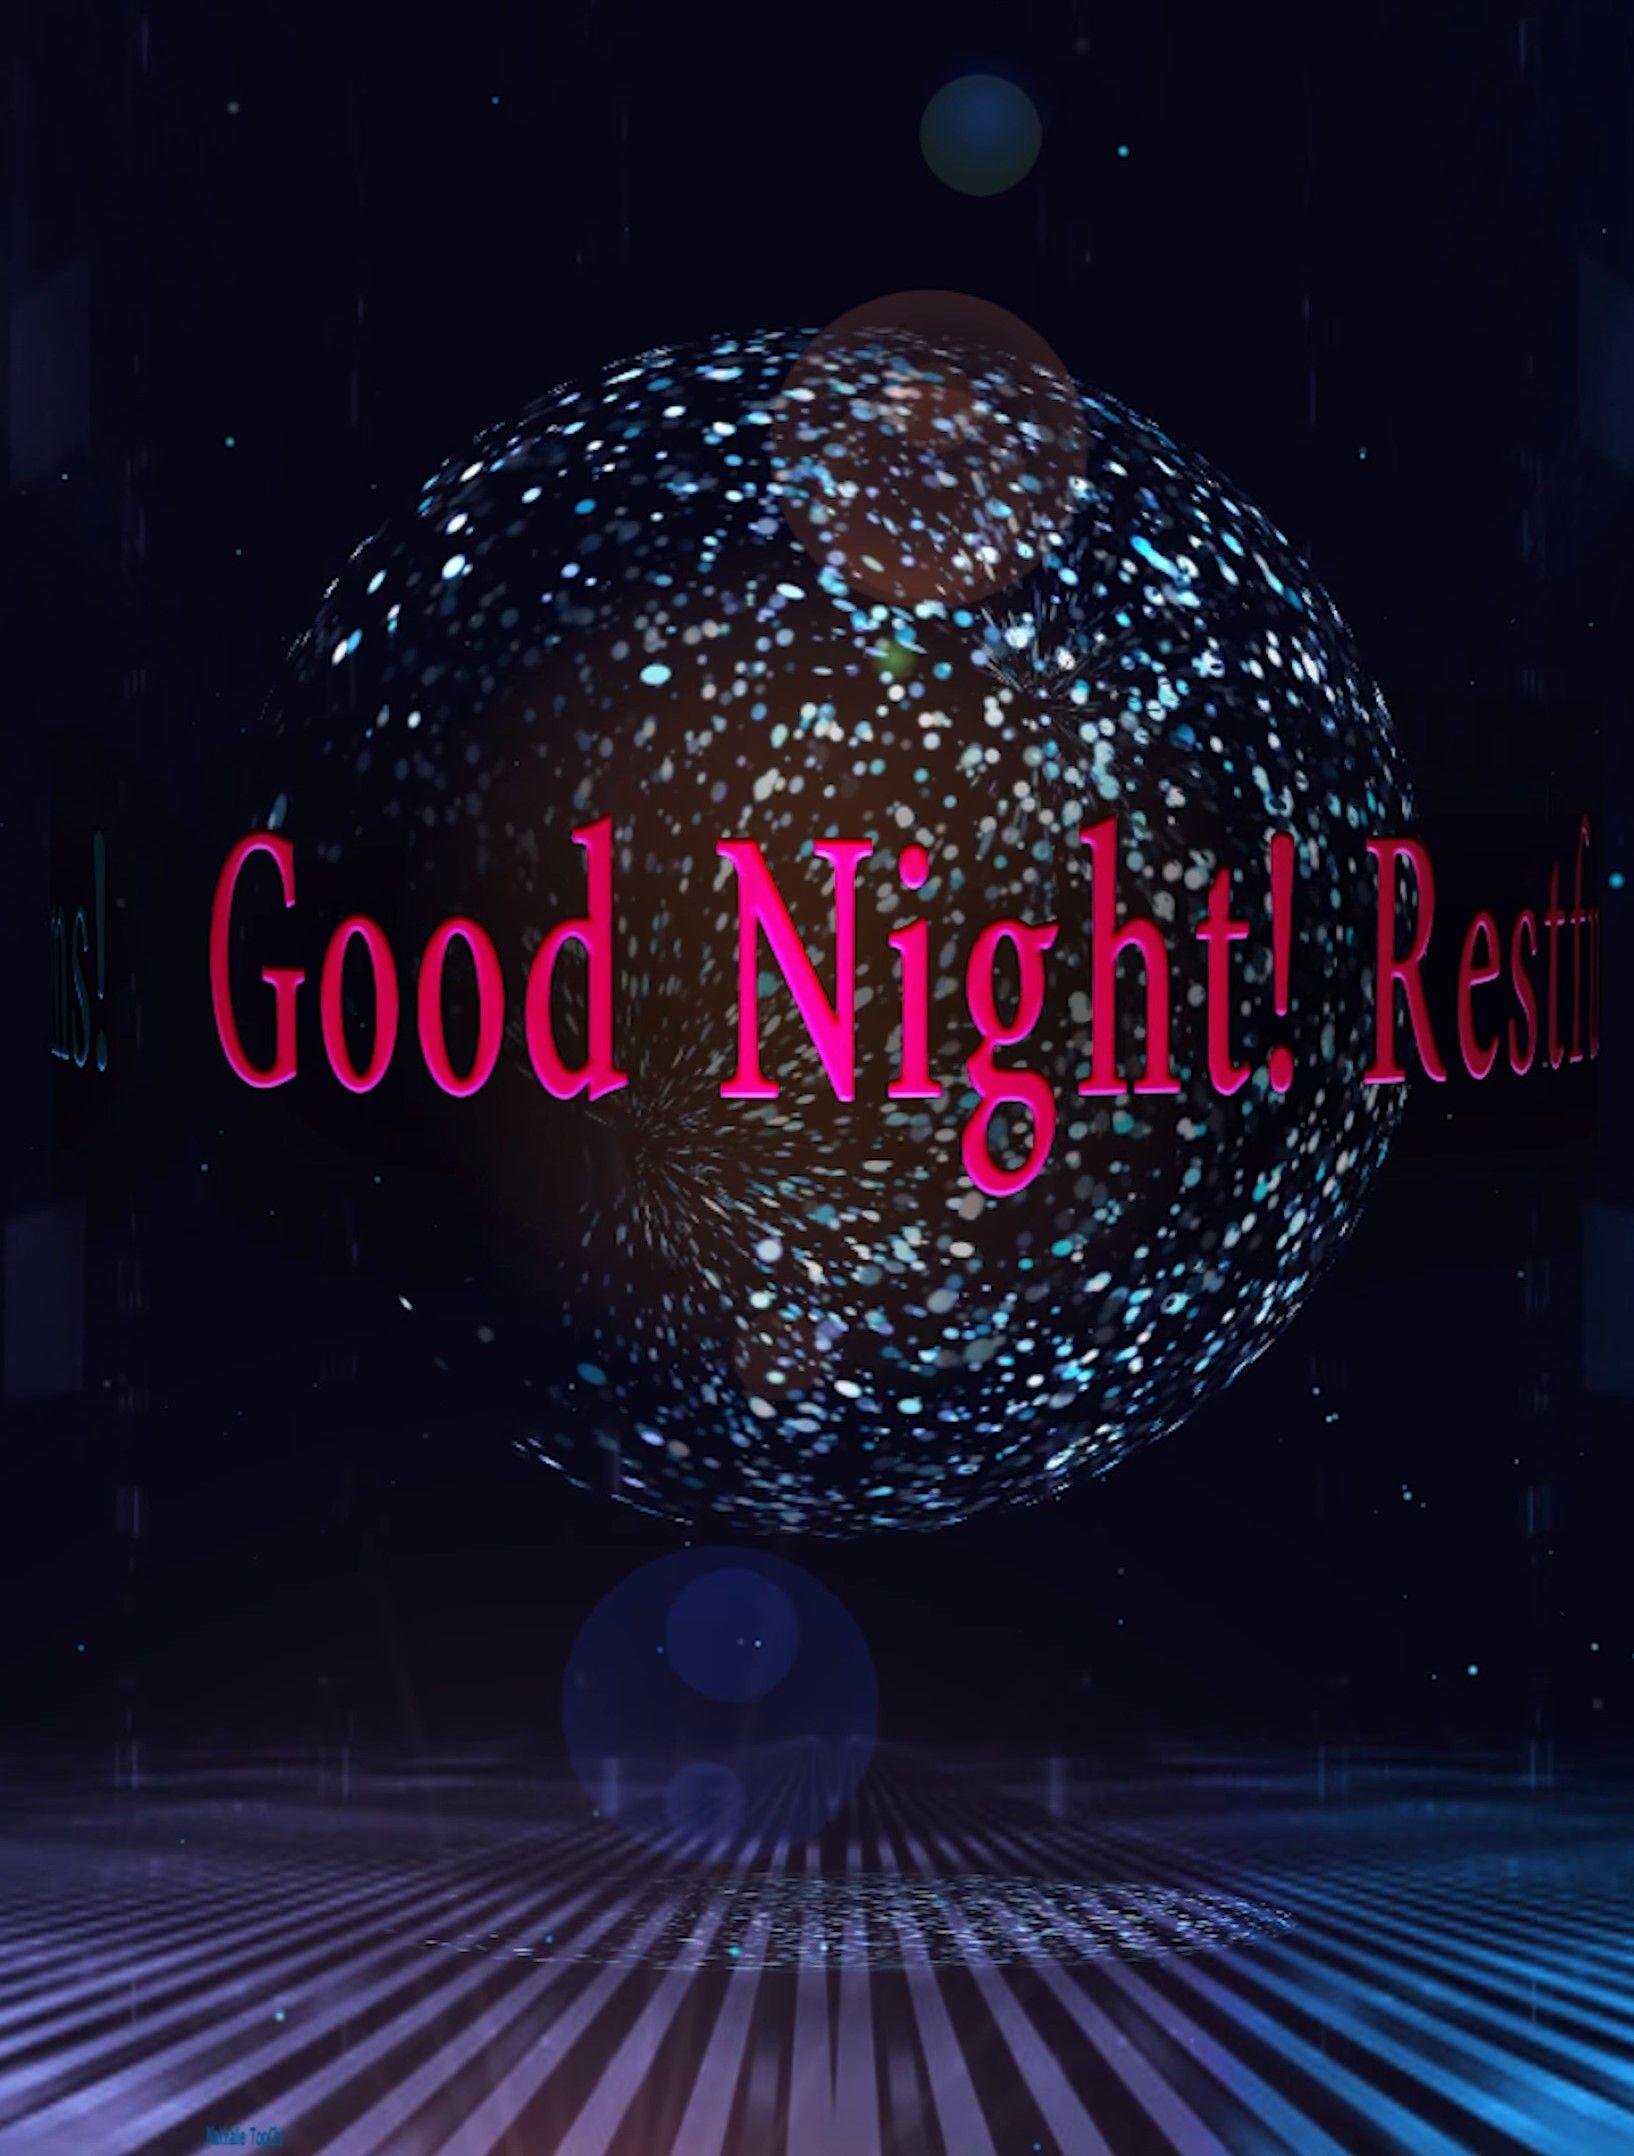 Good Night Sweet Dreams Good Night Beautiful Good Night Sweet Dreams Romantic Good Night